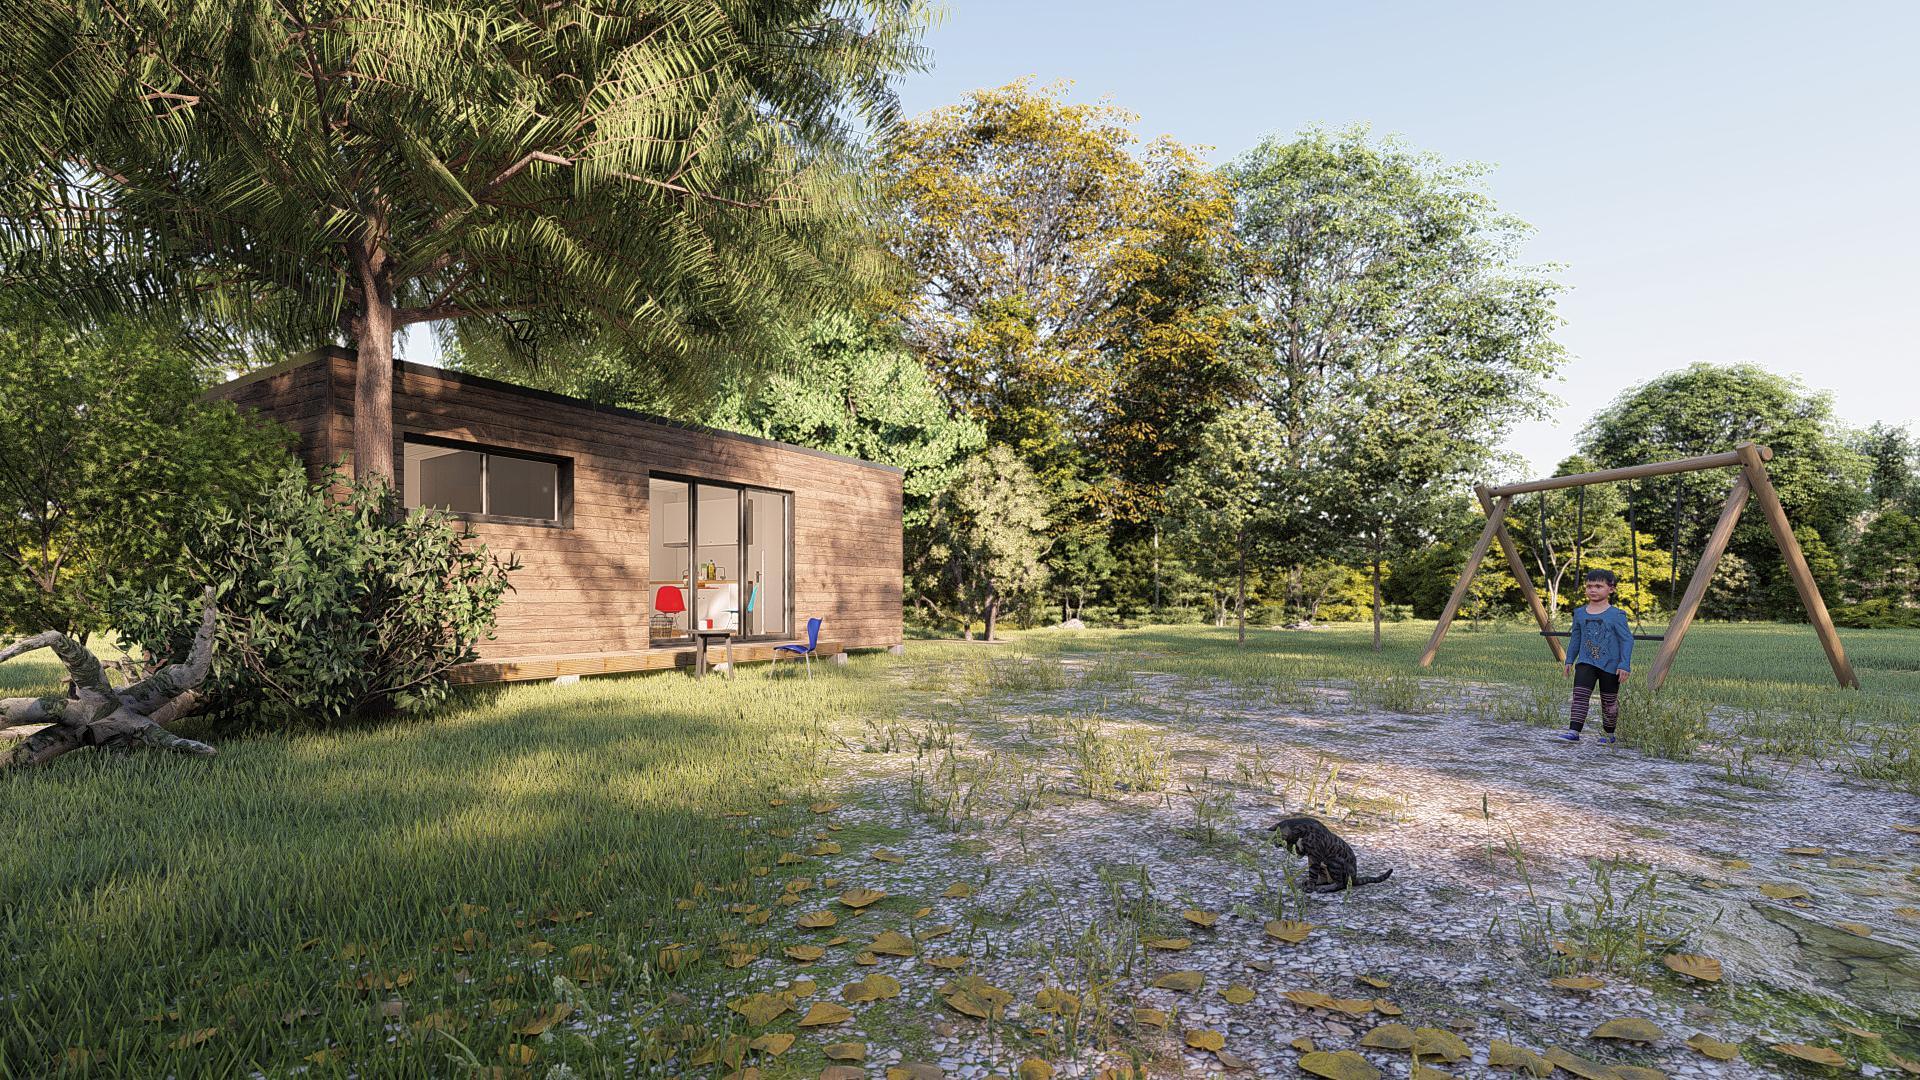 Aménager Un Petit Jardin De 20M2 studio de jardin 35m2 clé en main - woodyloft